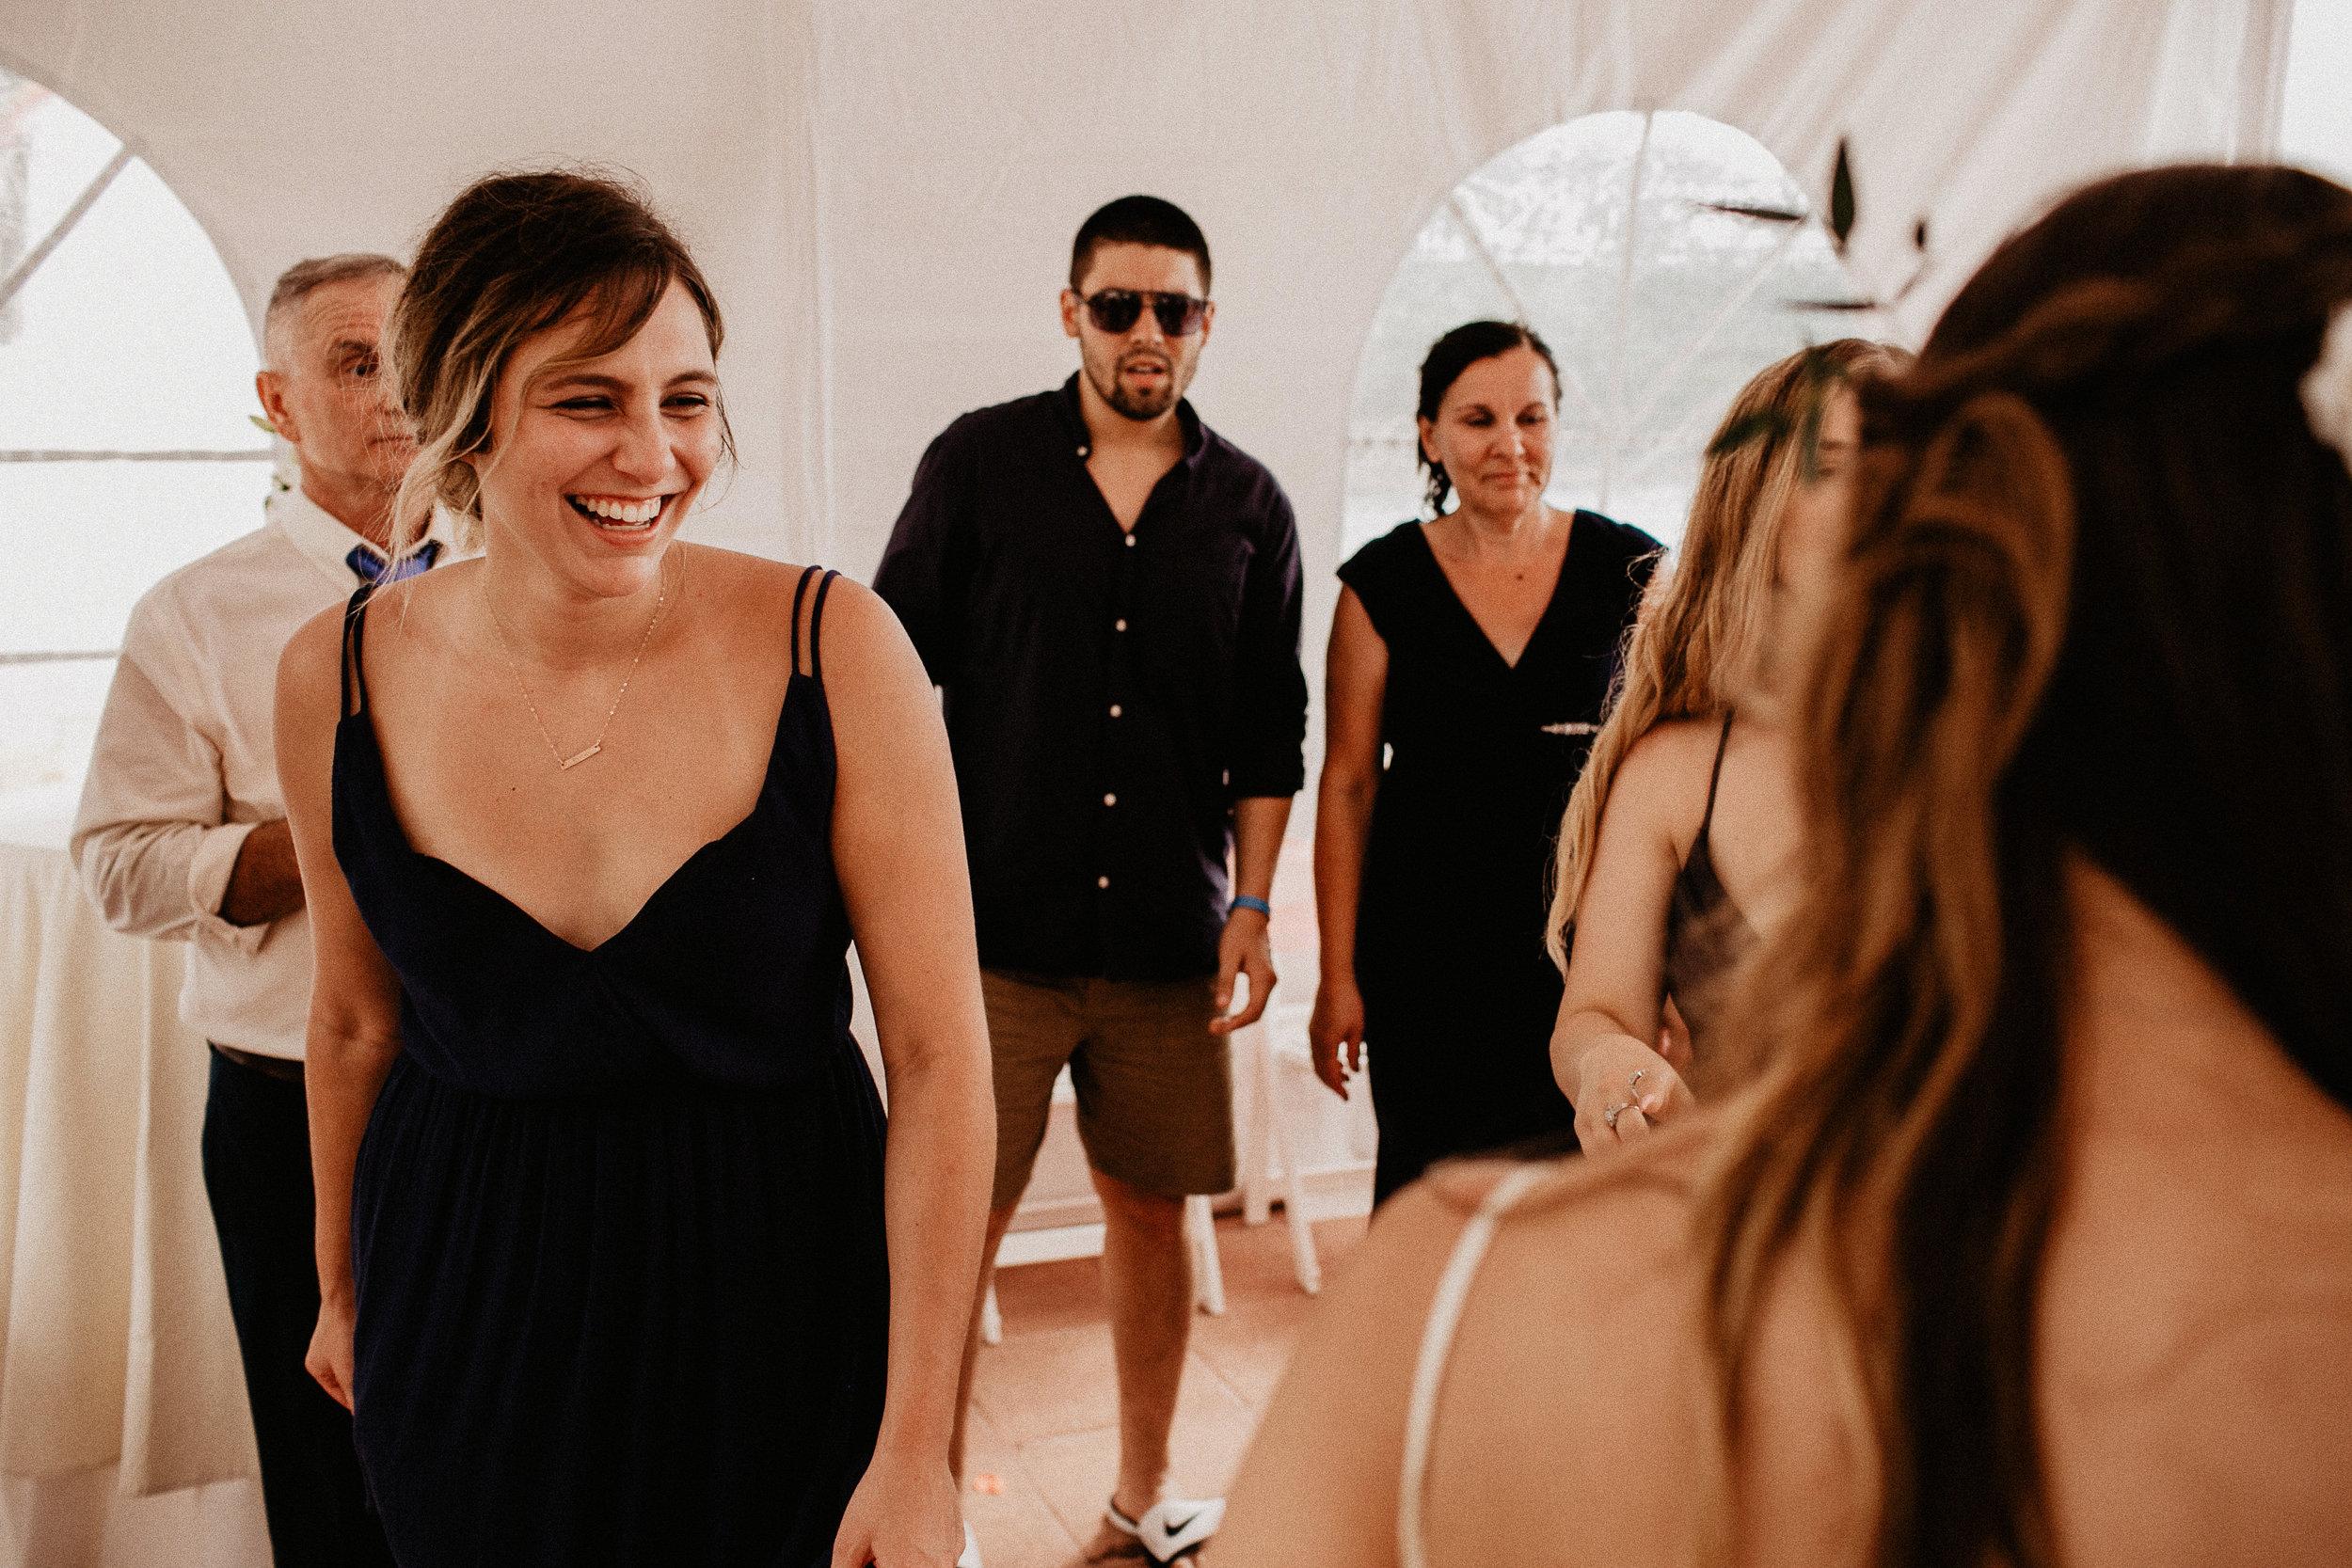 alfonso_flores_destination_wedding_photography_puerto_vallarta_hotel_barcelo_vallarta_cuttler_amela-507.JPG